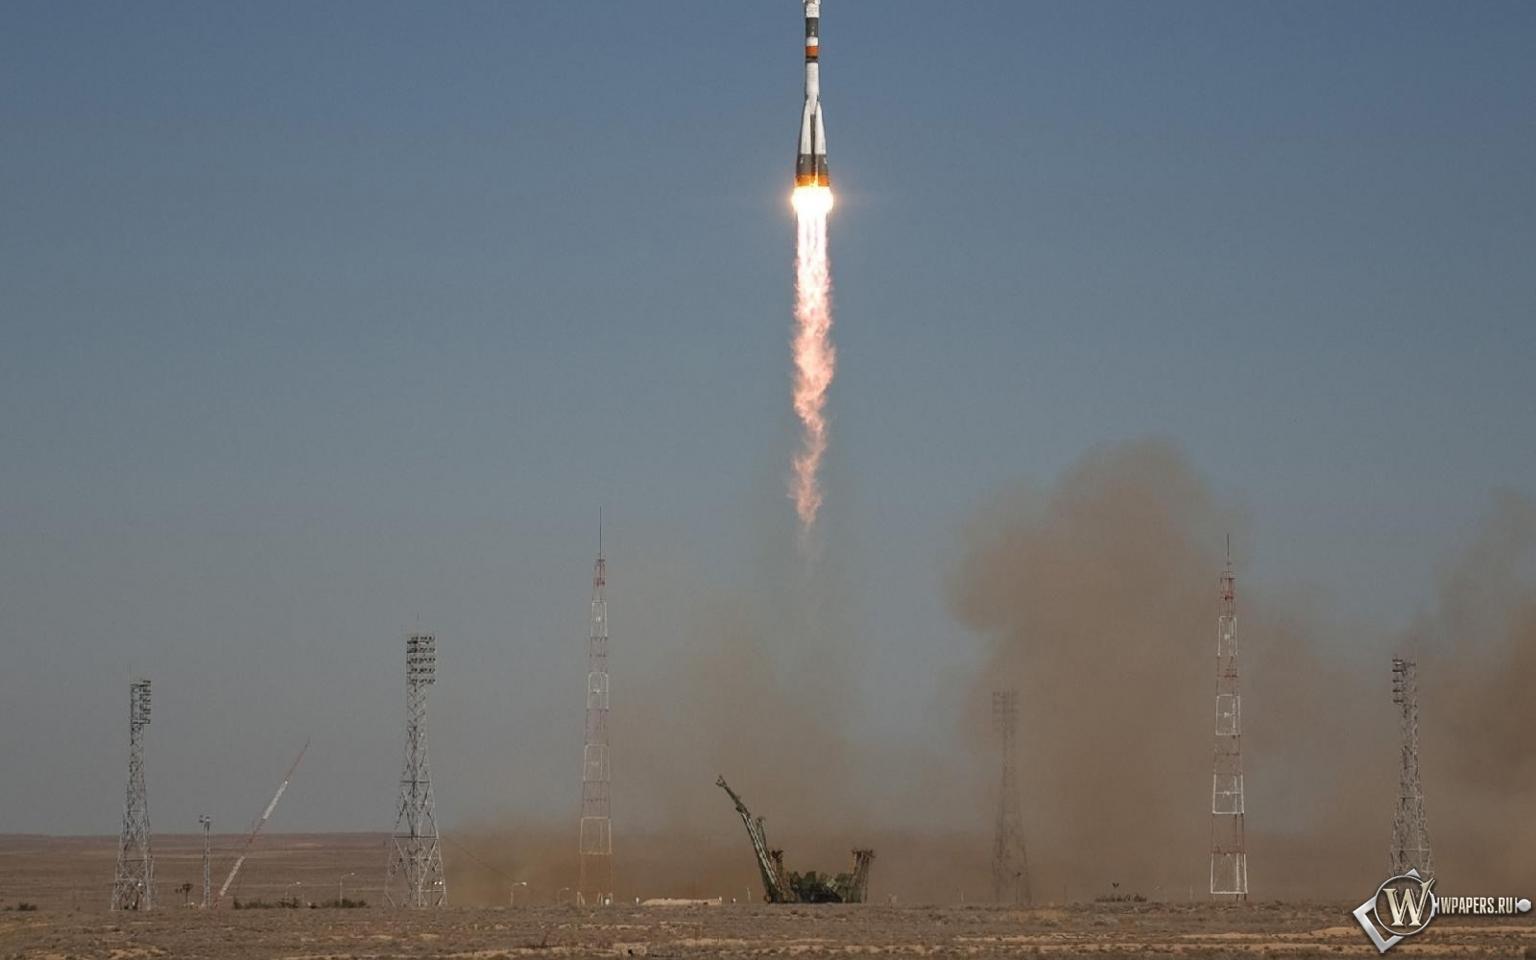 Запуск ракеты Союз ТМА-16 1536x960